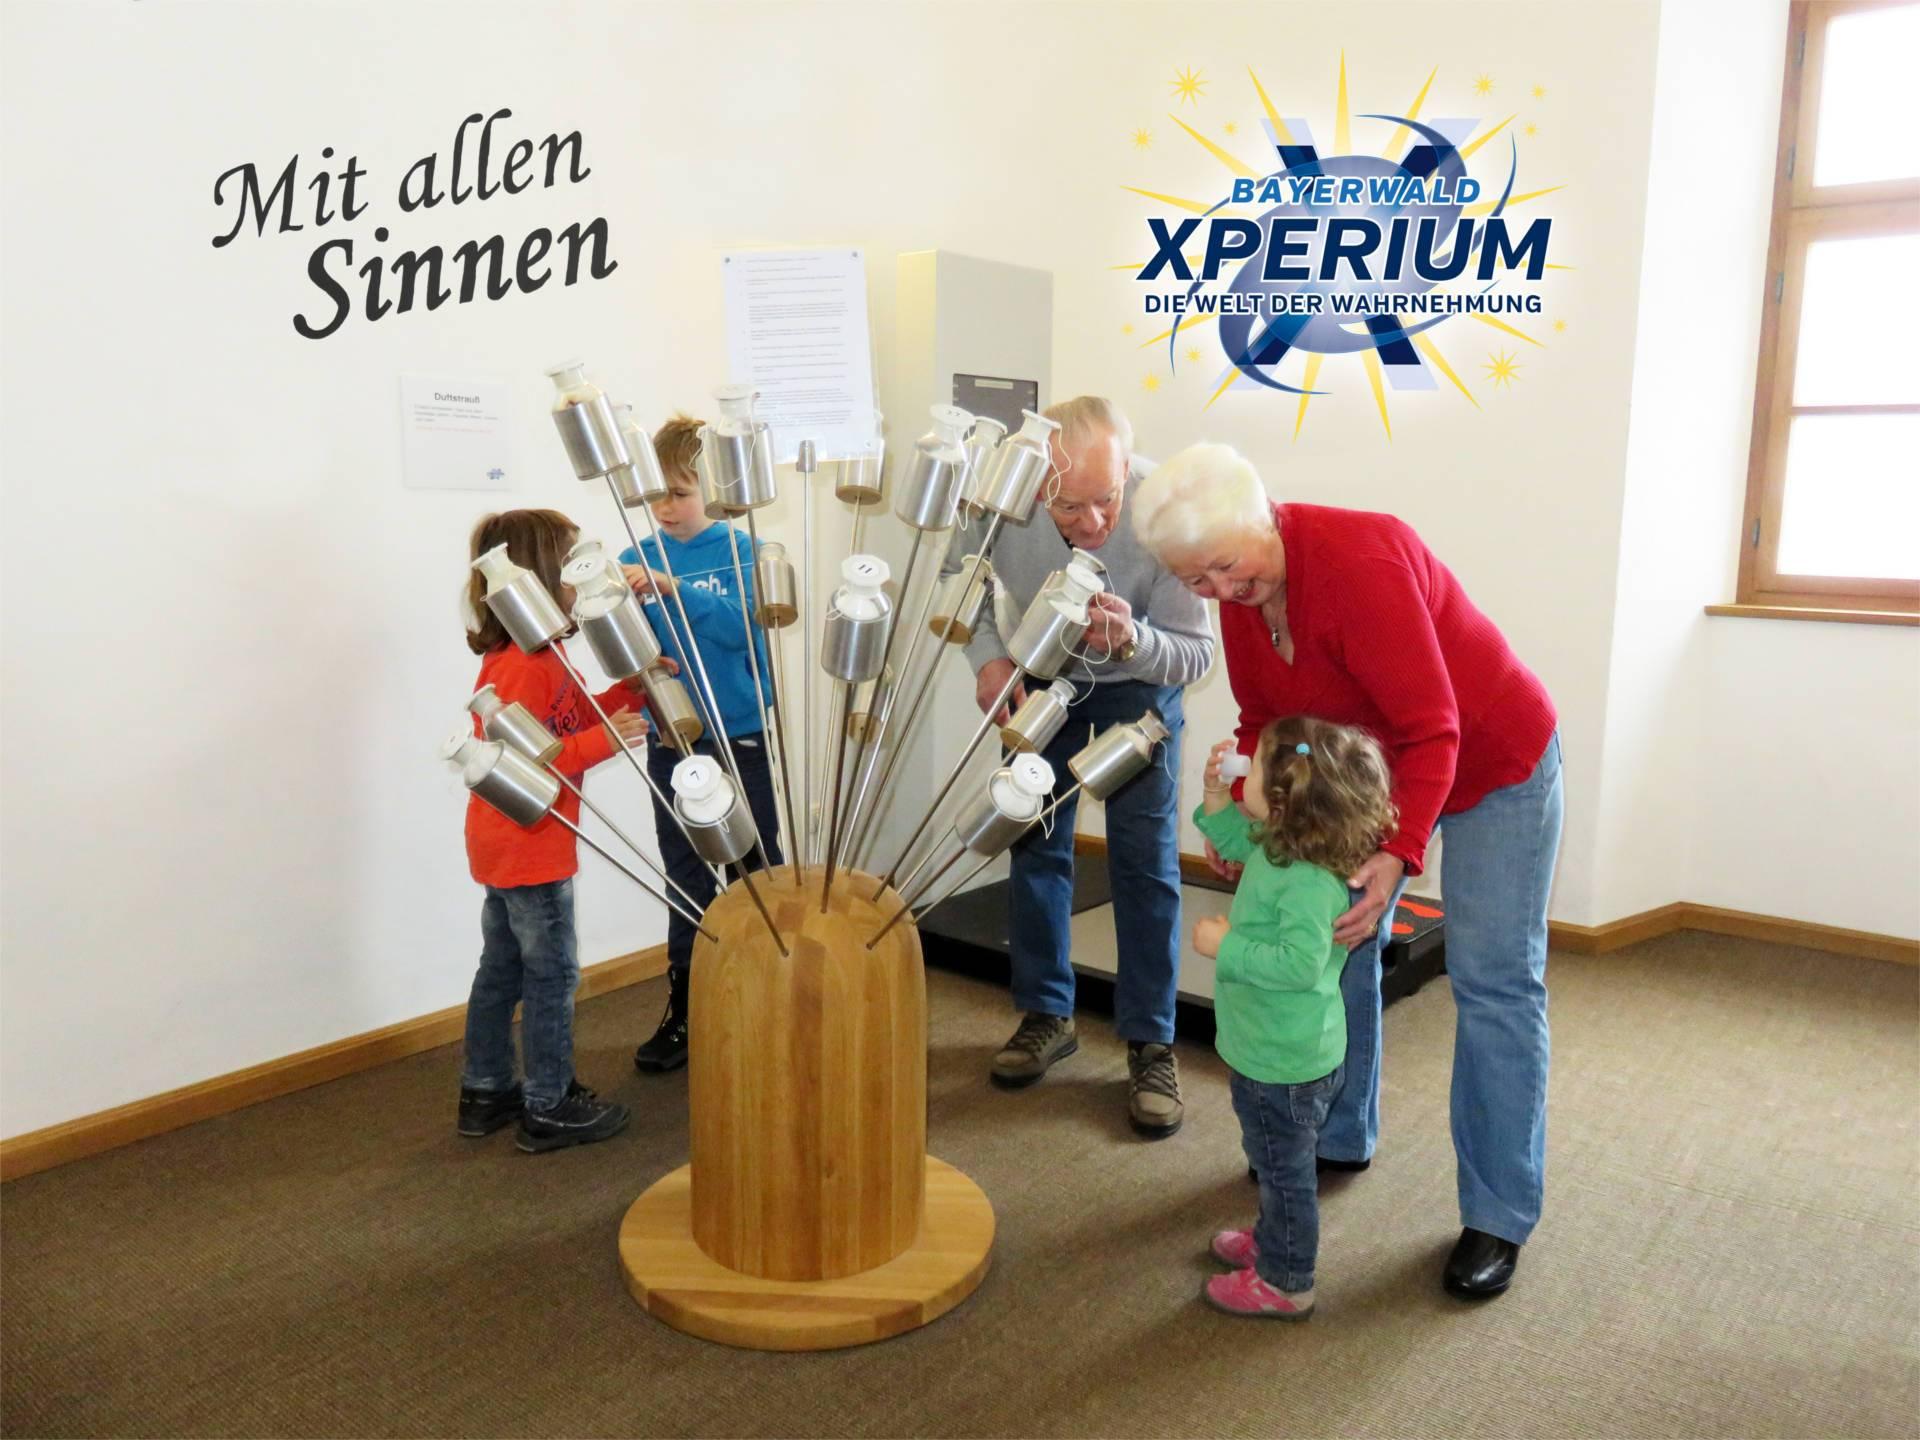 Bayerwald Xperium GmbH